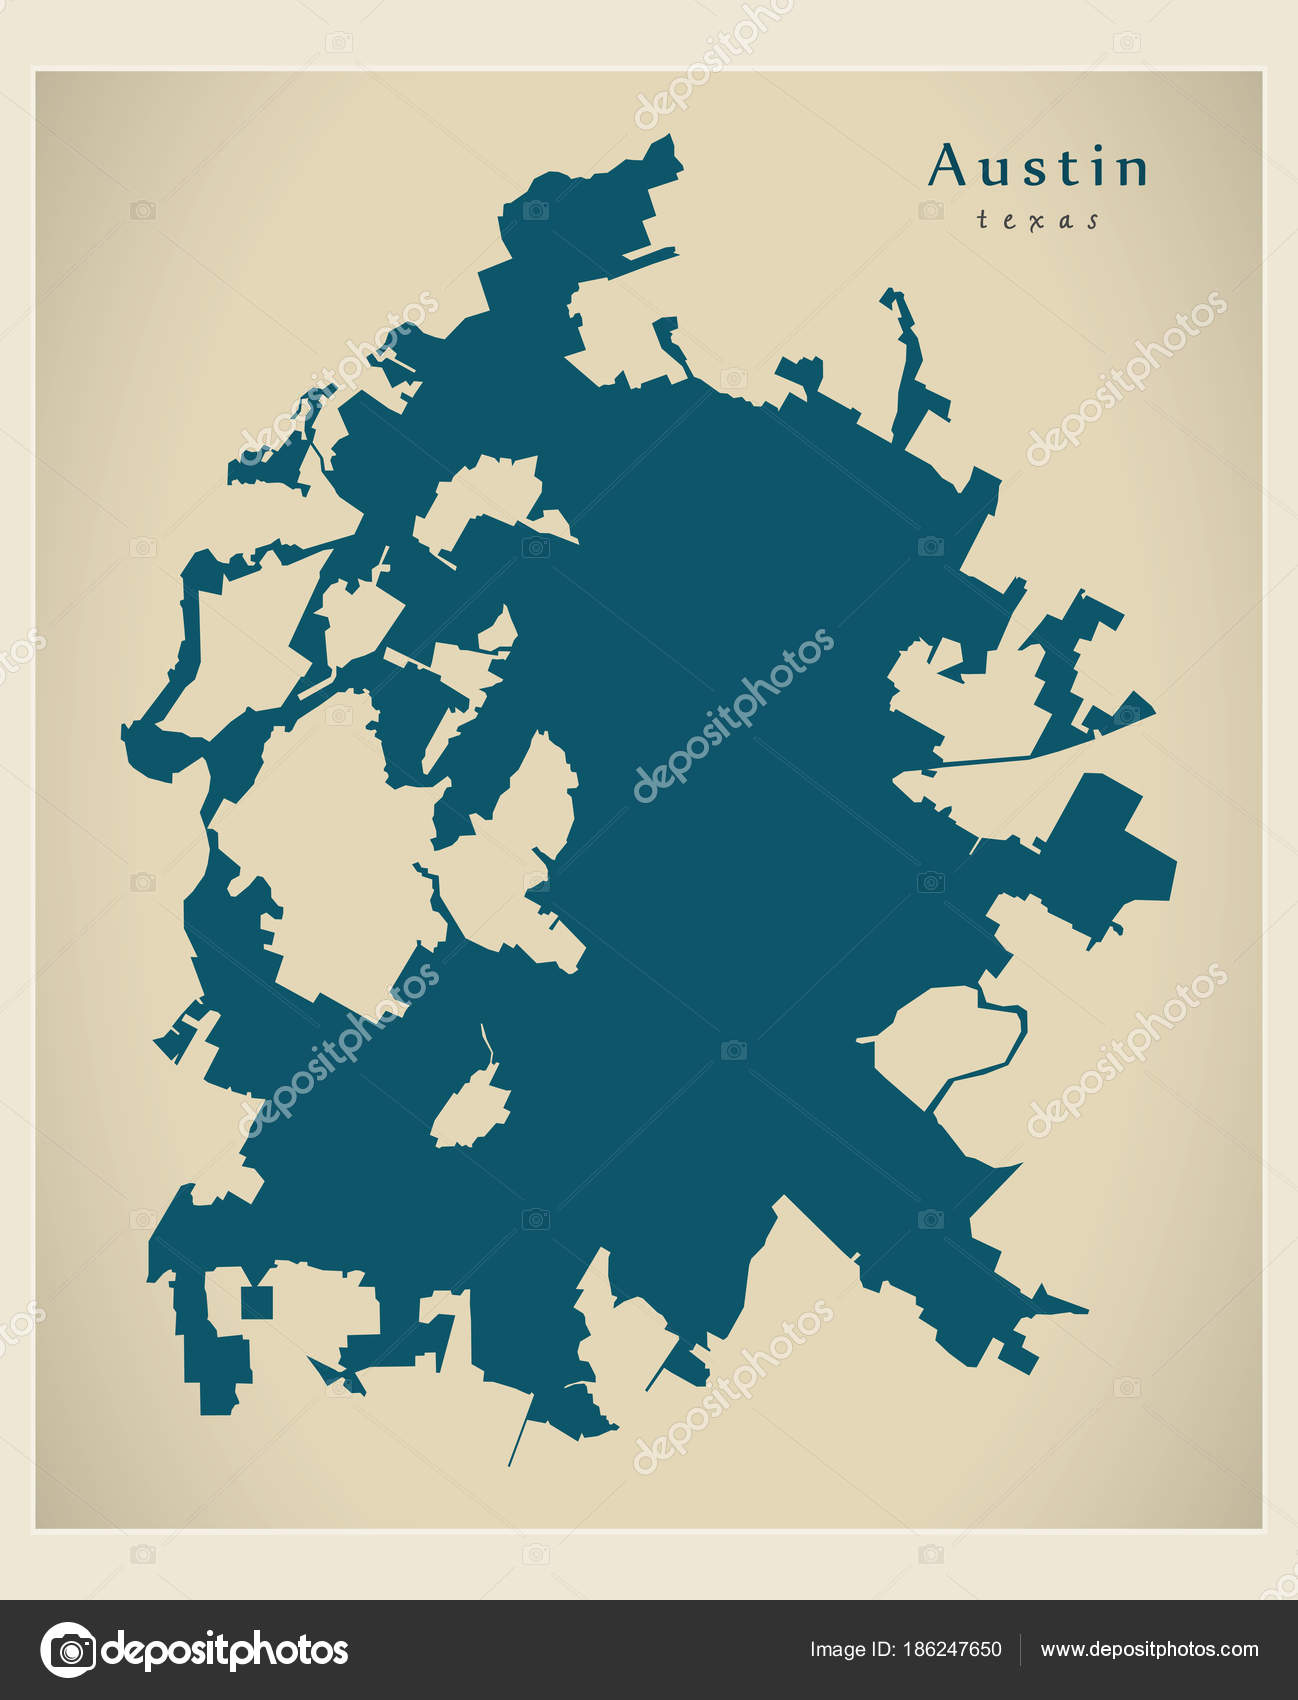 City Map Of Texas.Modern City Map Austin Texas City Of The Usa Stock Vector